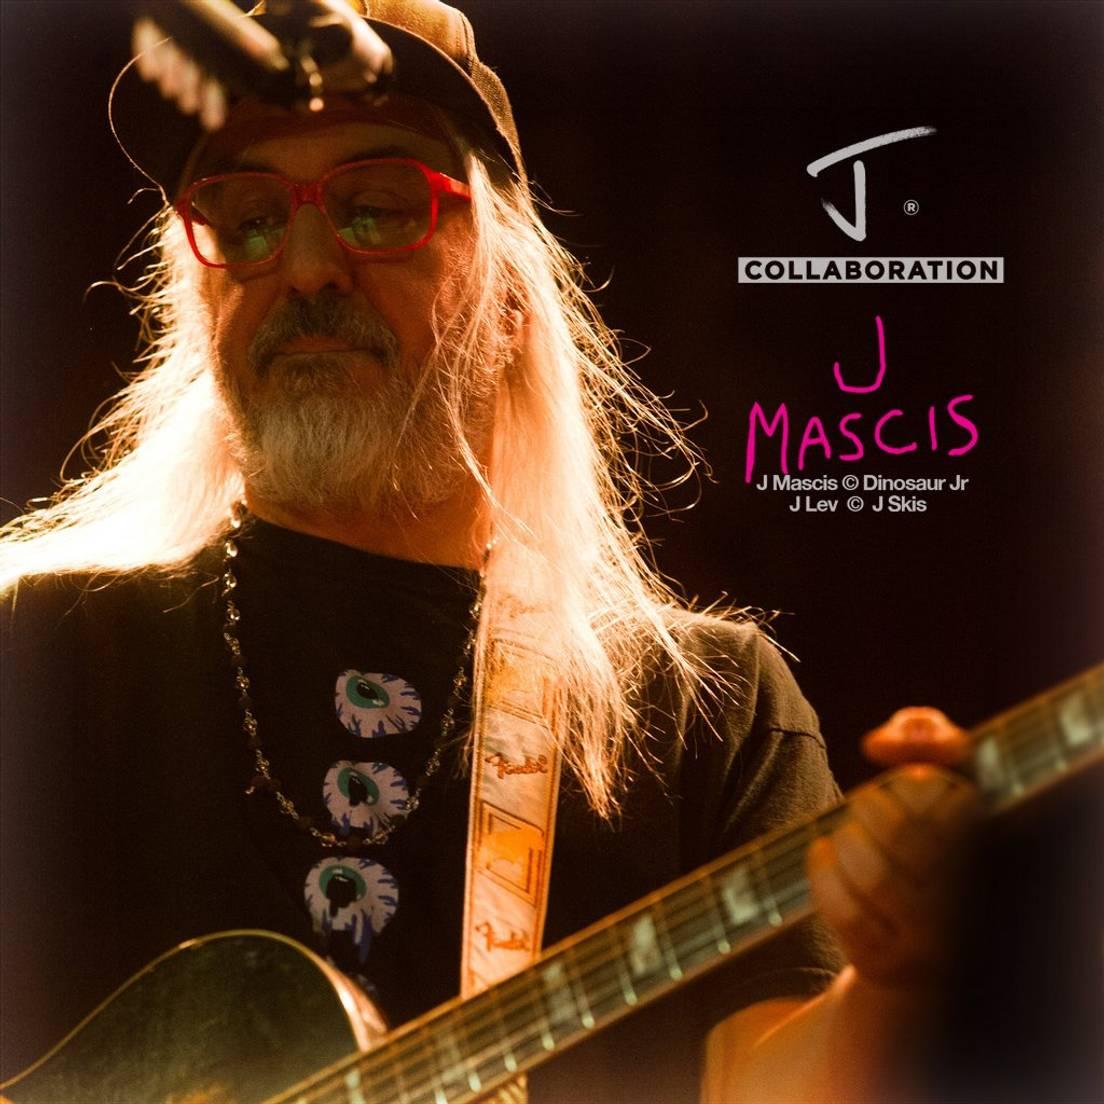 J Mascis